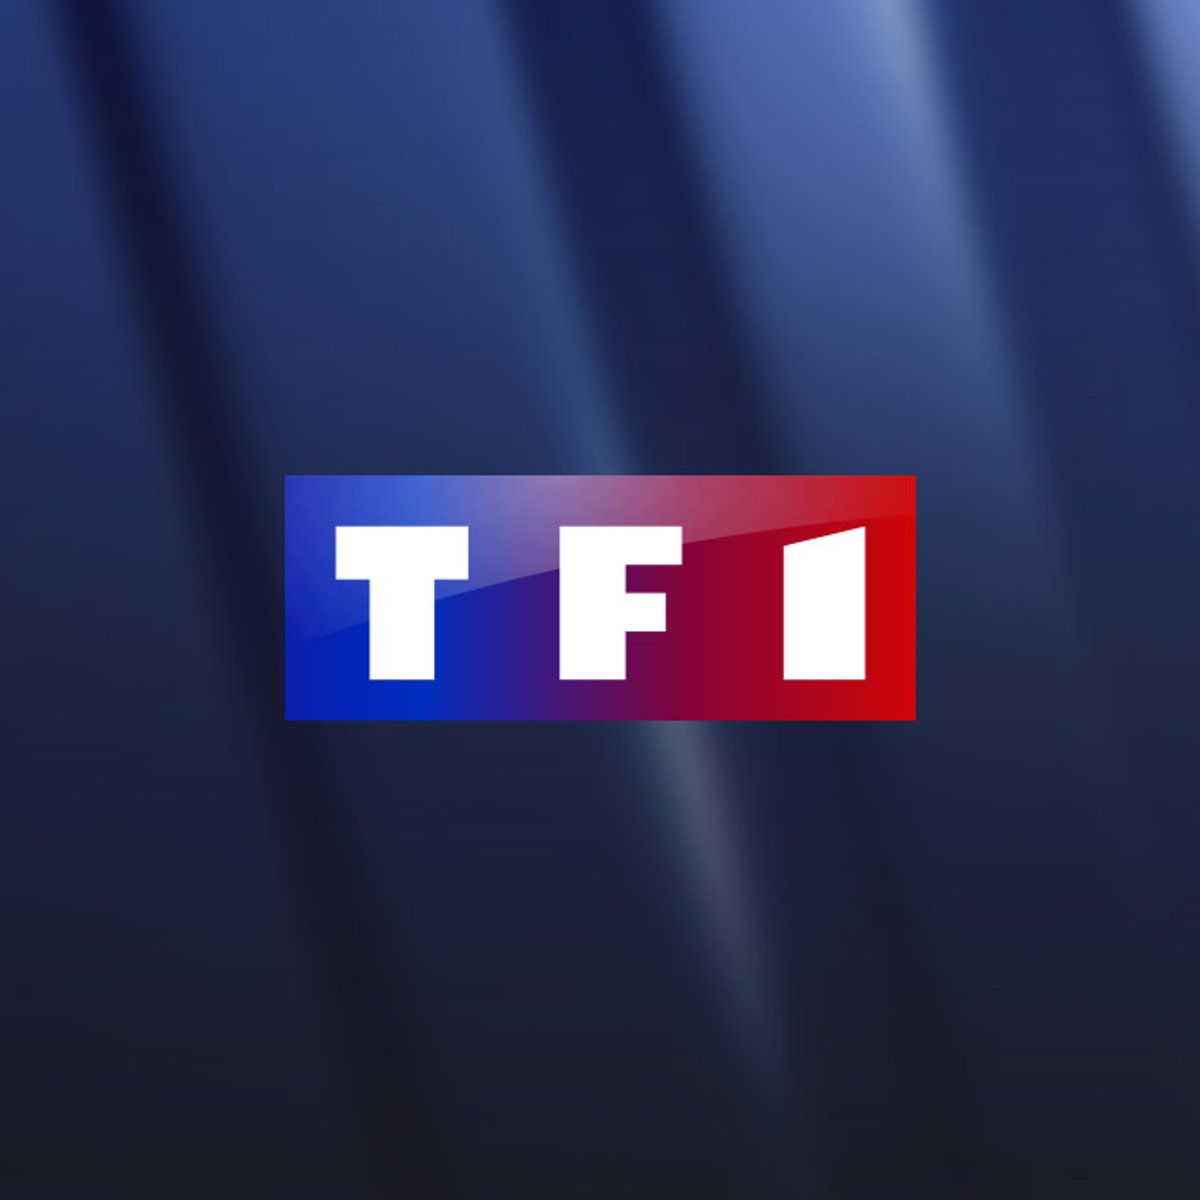 Regardez en direct ou en replay tous vos programmes favoris sur mytf1 : TF1 : Replay, Direct, Vidéos et news | MYTF1